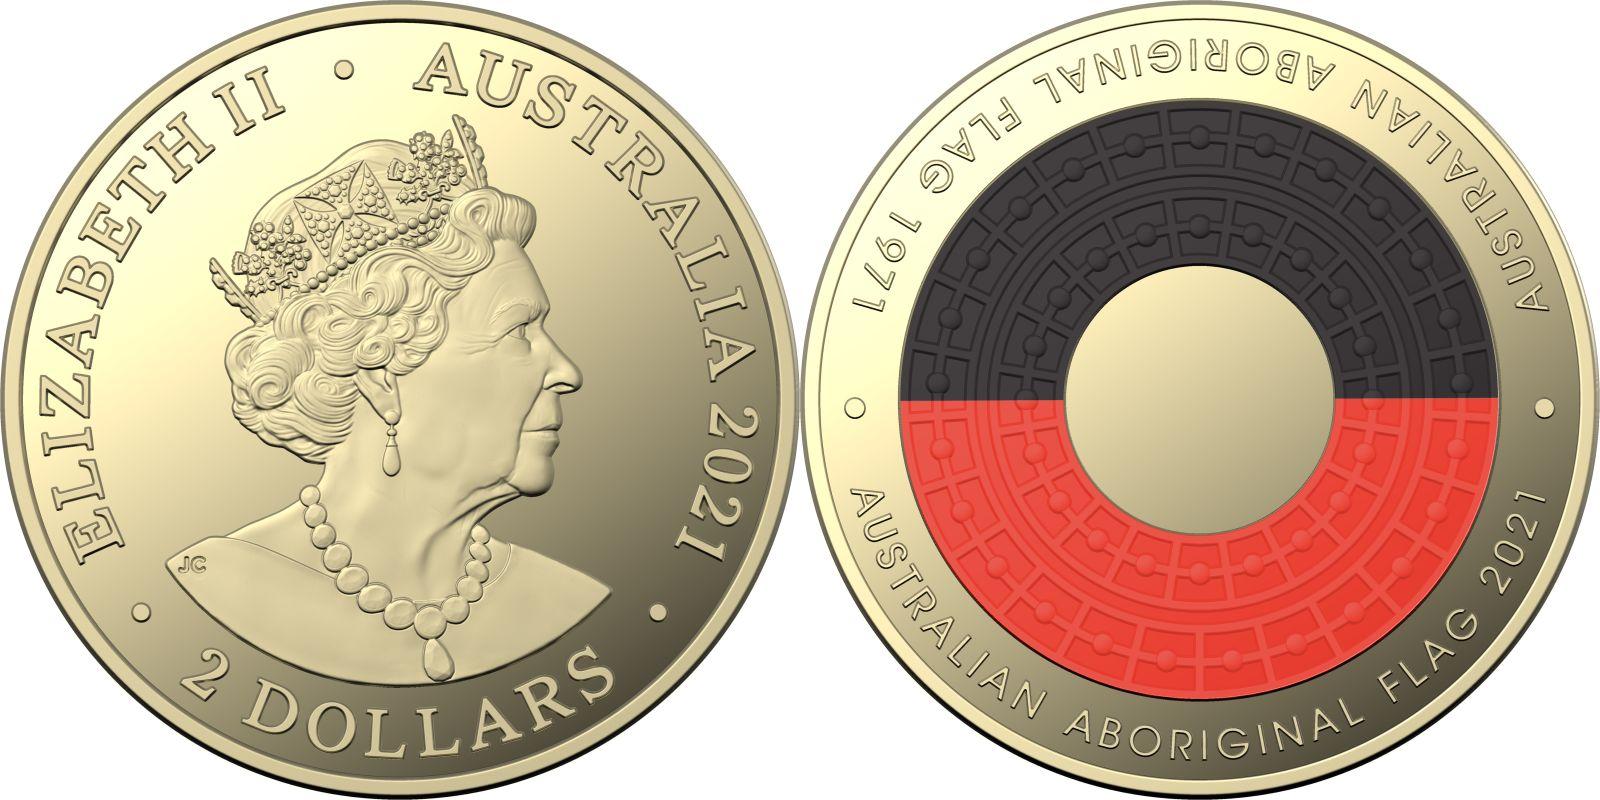 1966 australian proof coin set